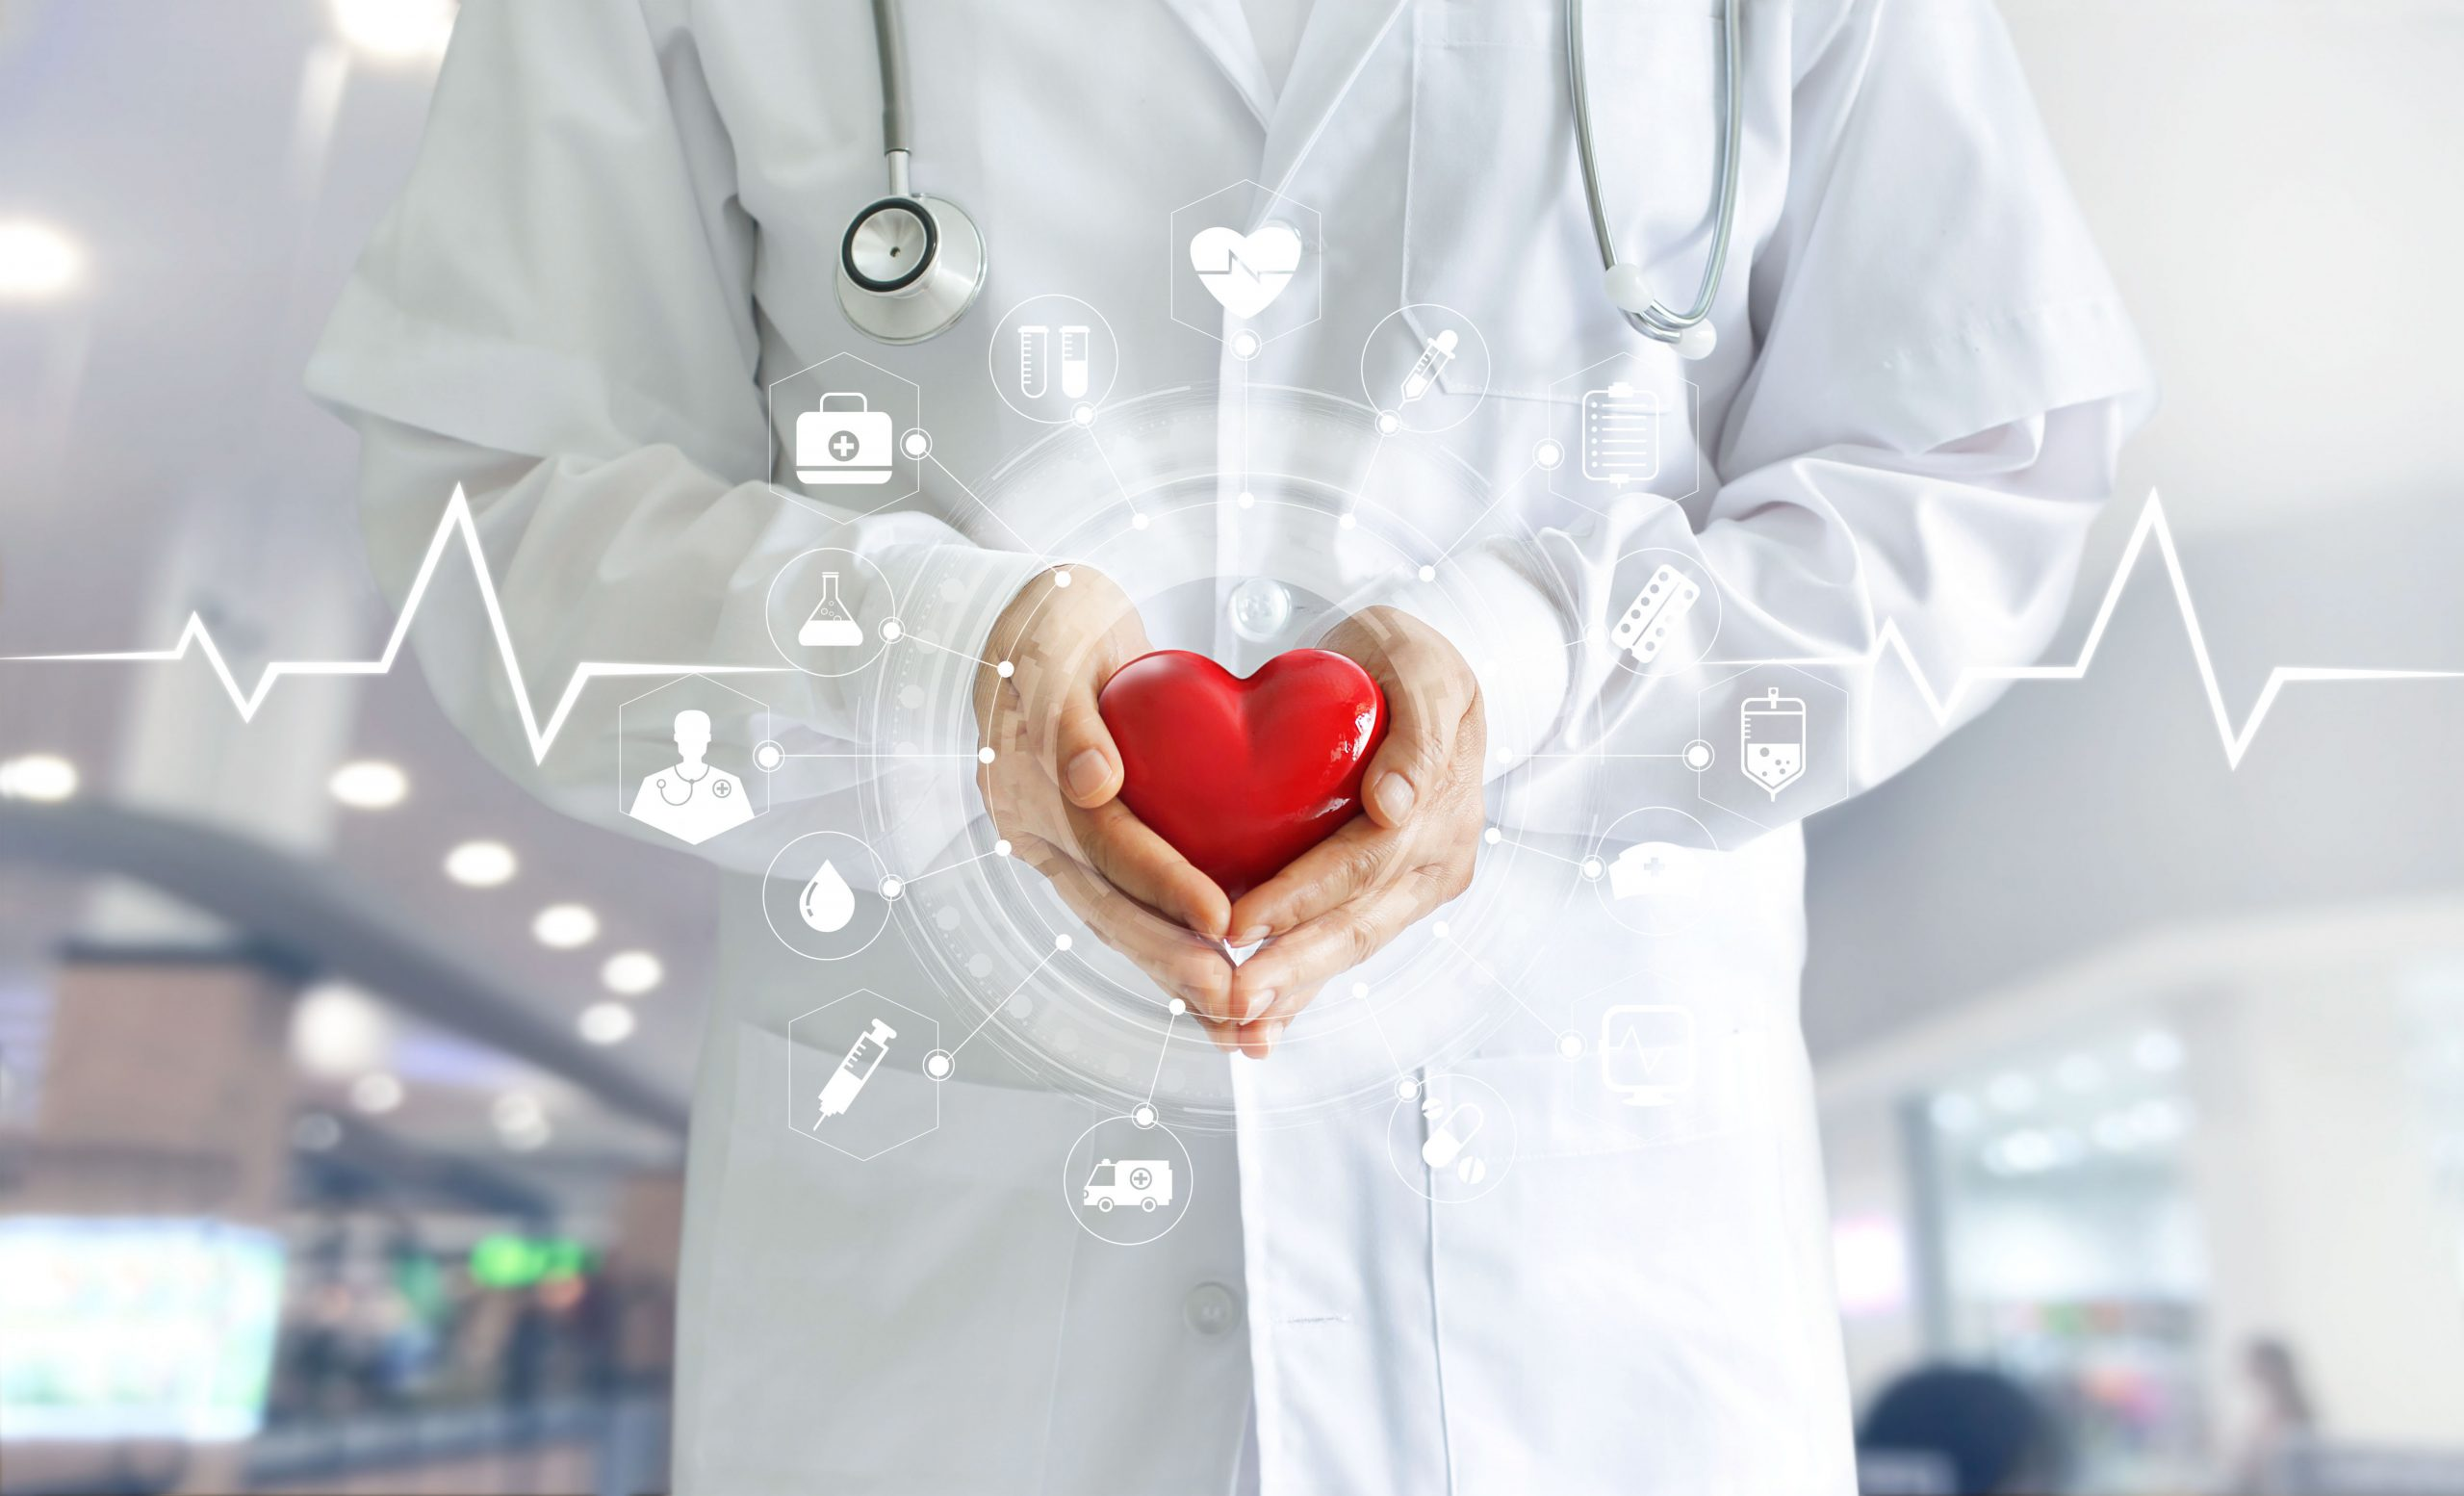 dr pop md medicine diabetes 54